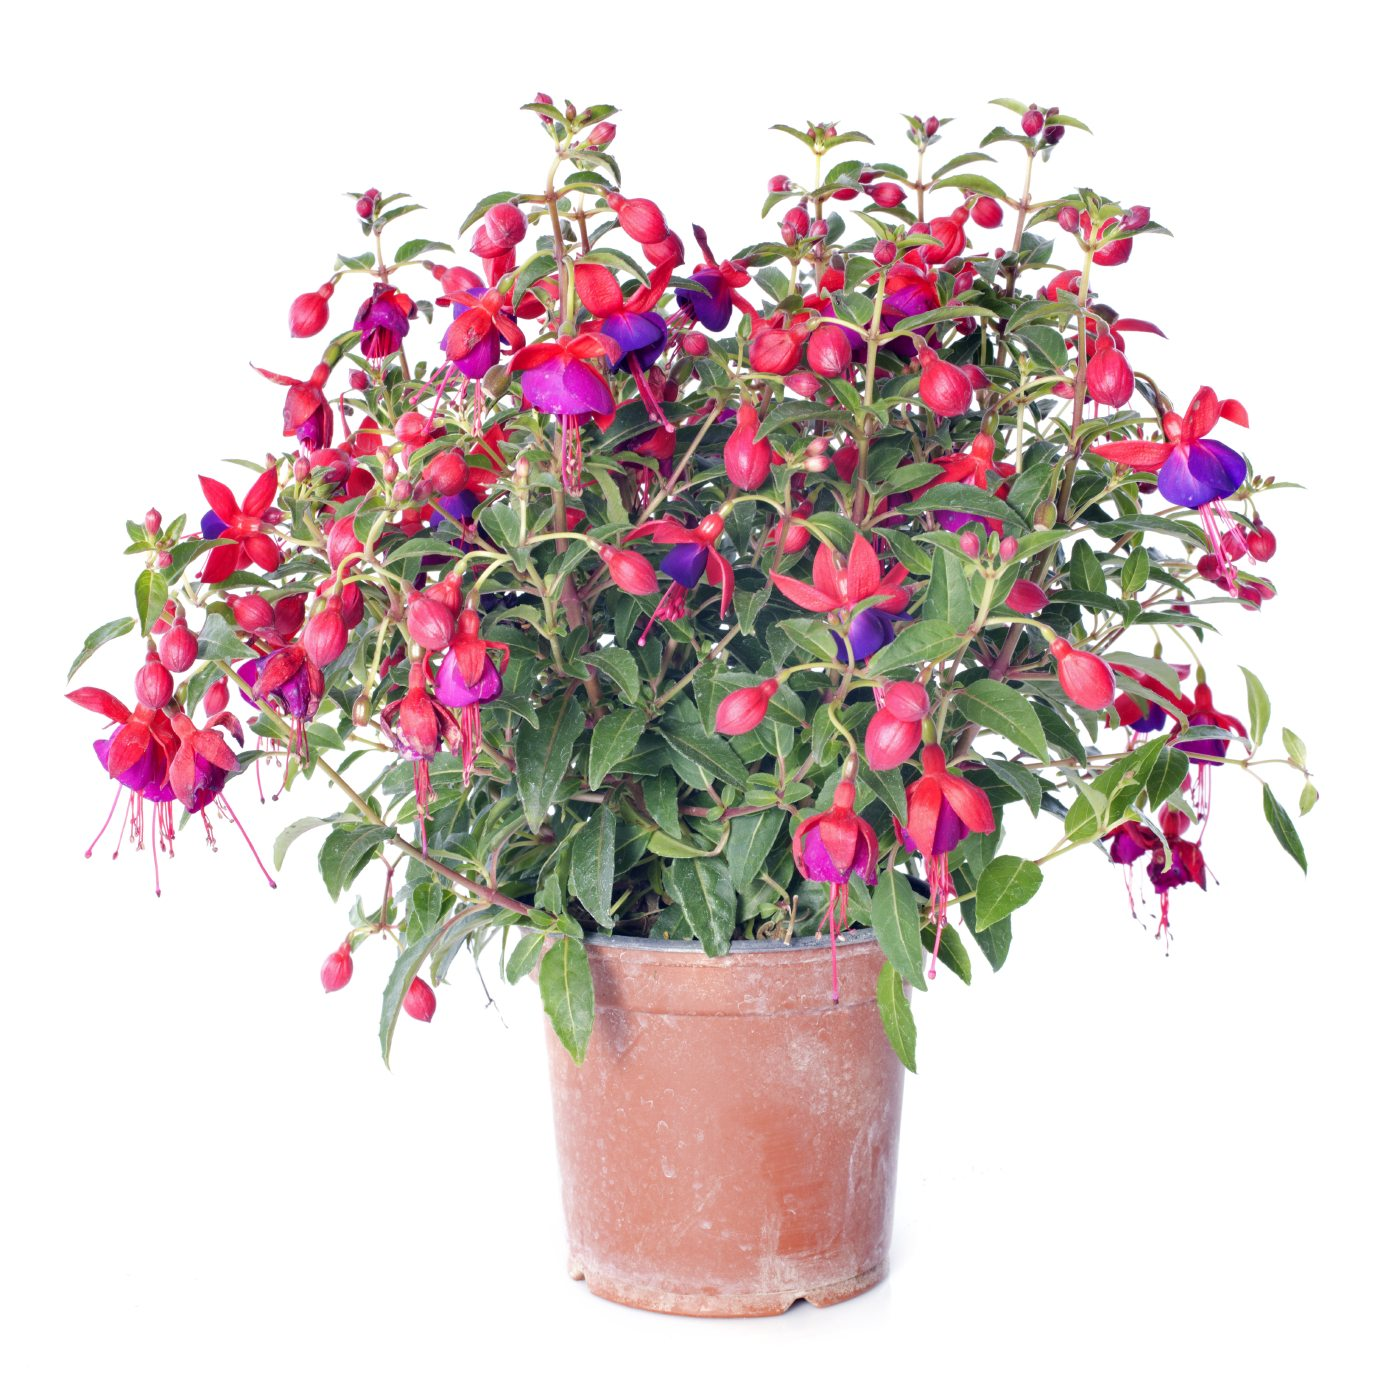 How To Grow Fuchsias Indoors